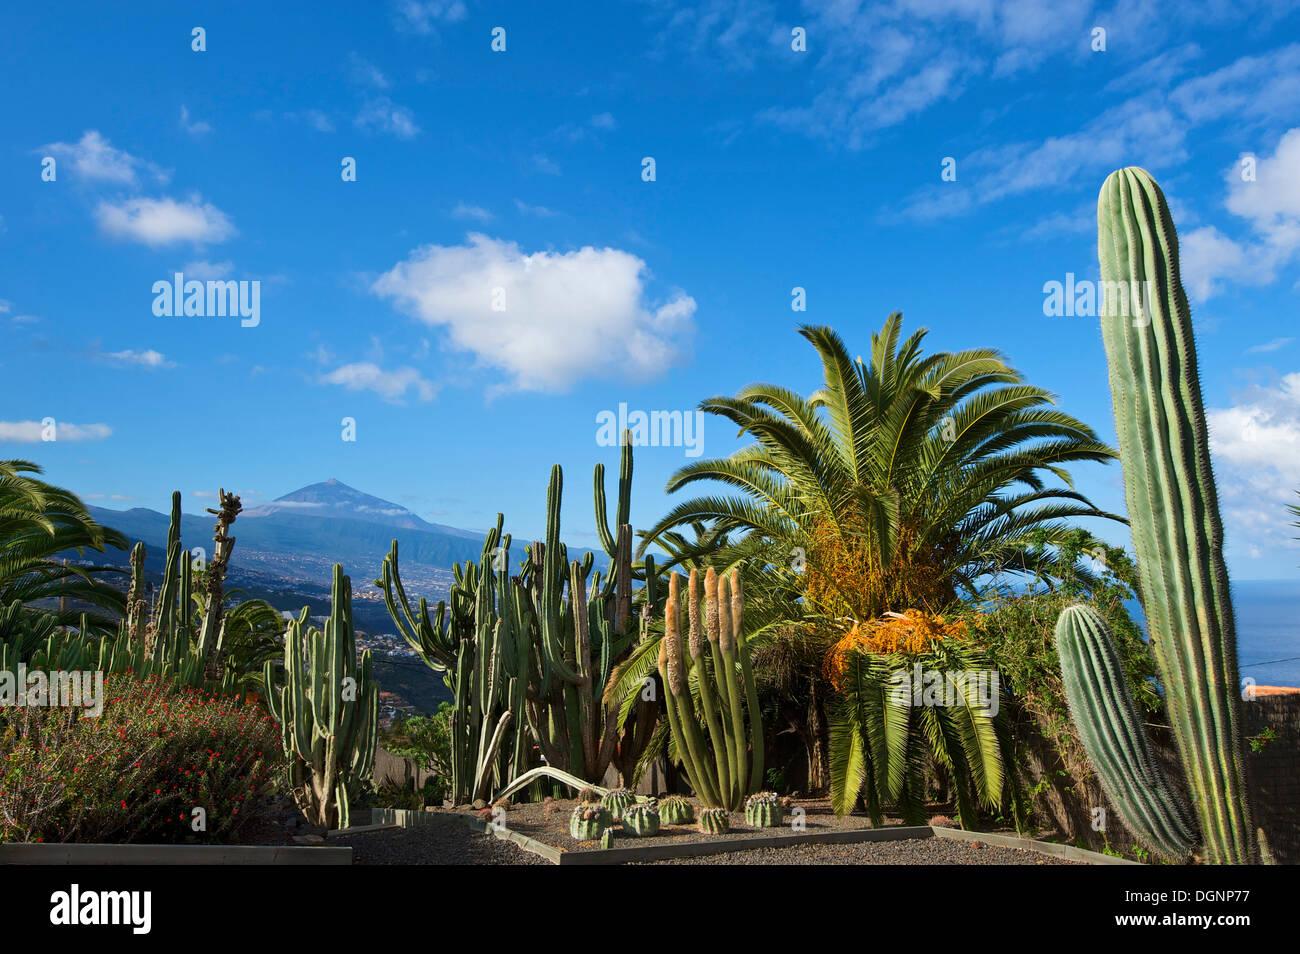 Kakteengarten in El Sauzal mit Blick auf den Teide Vulkan, Teneriffa, Kanarische Inseln, Spanien, Europa Stockbild